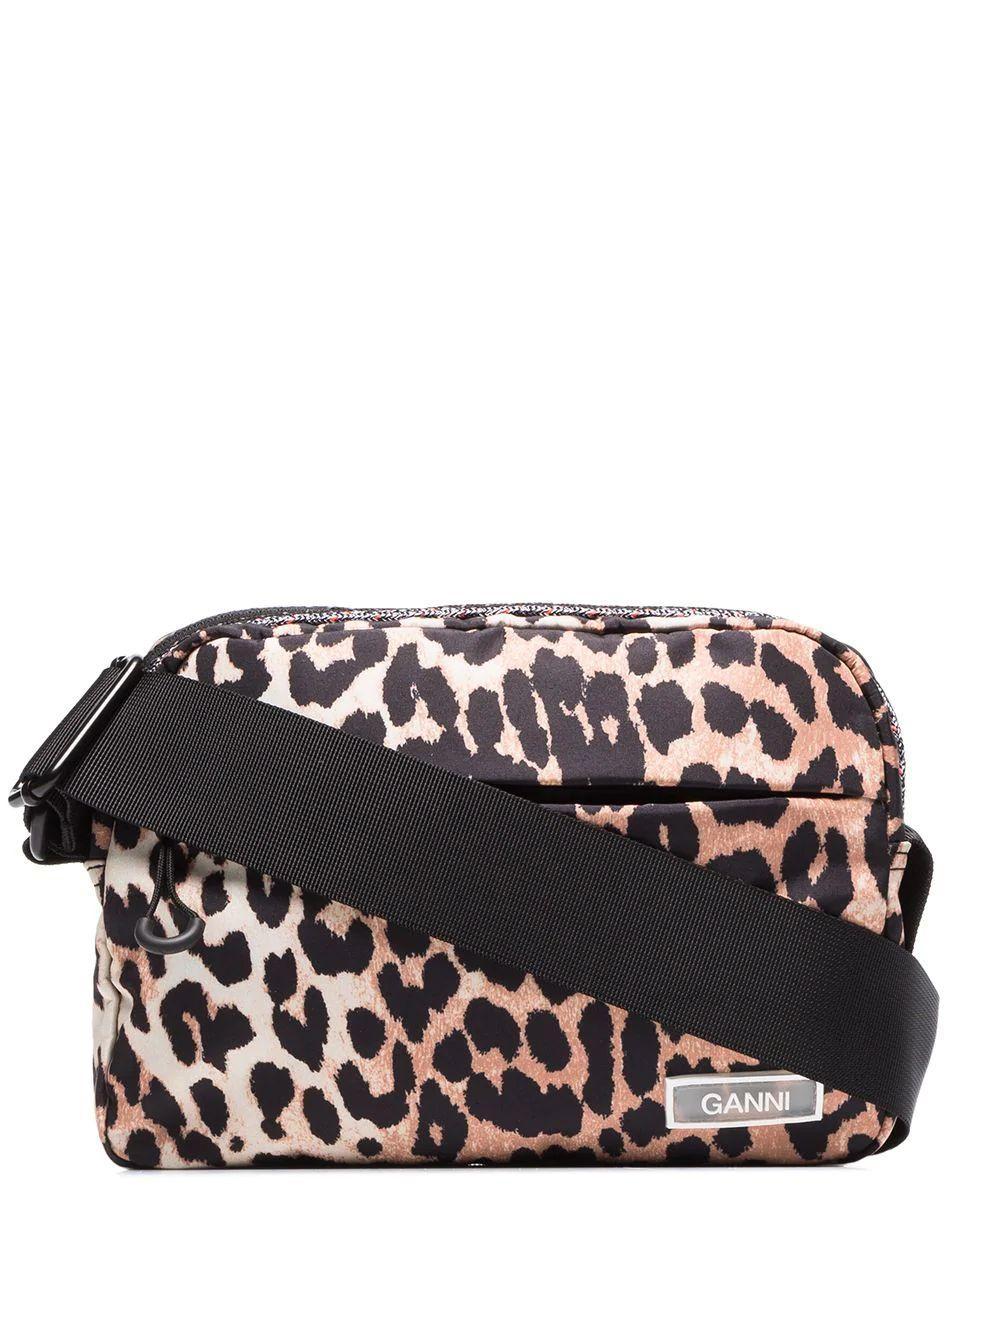 Leopard Crossbody Item # A2189